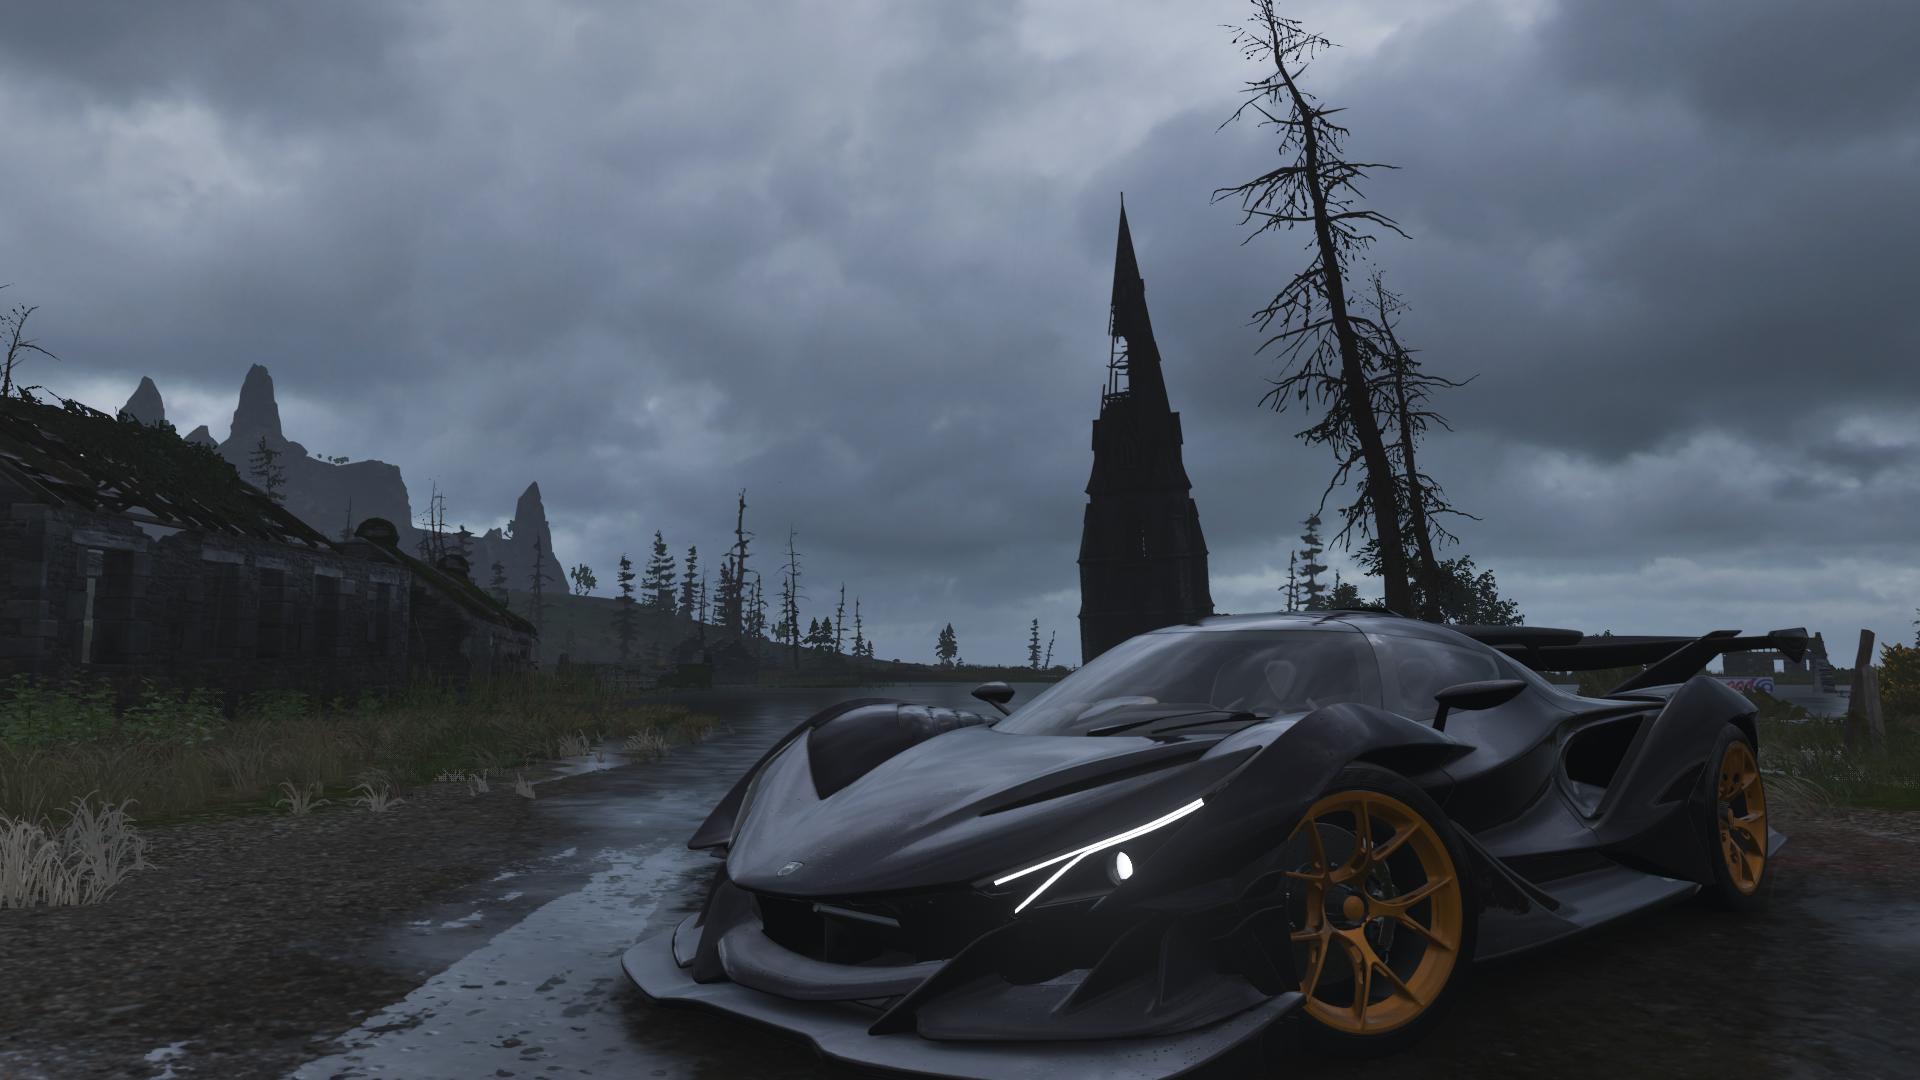 Forza Horizon 4 Screen Shot Car Video Games Vehicle Black Cars 1920x1080